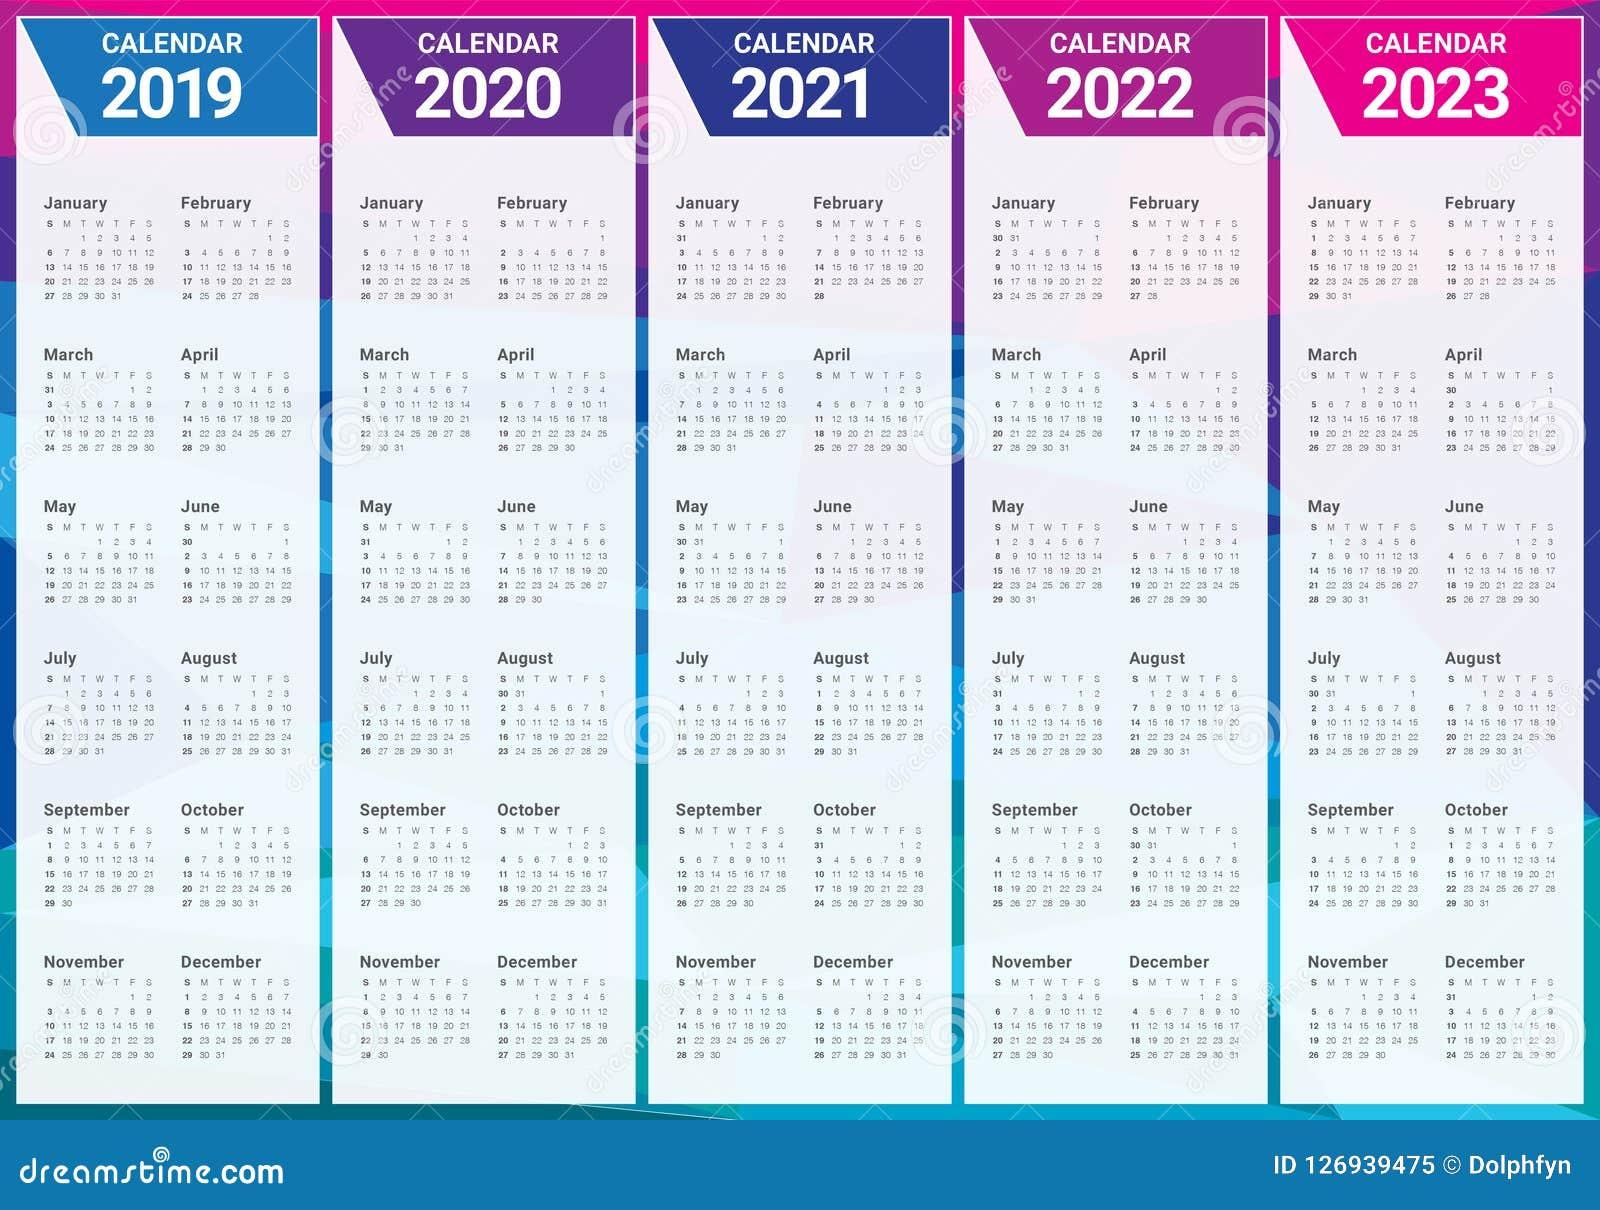 Year 2019 2020 2021 2022 2023 Calendar Vector Design Template